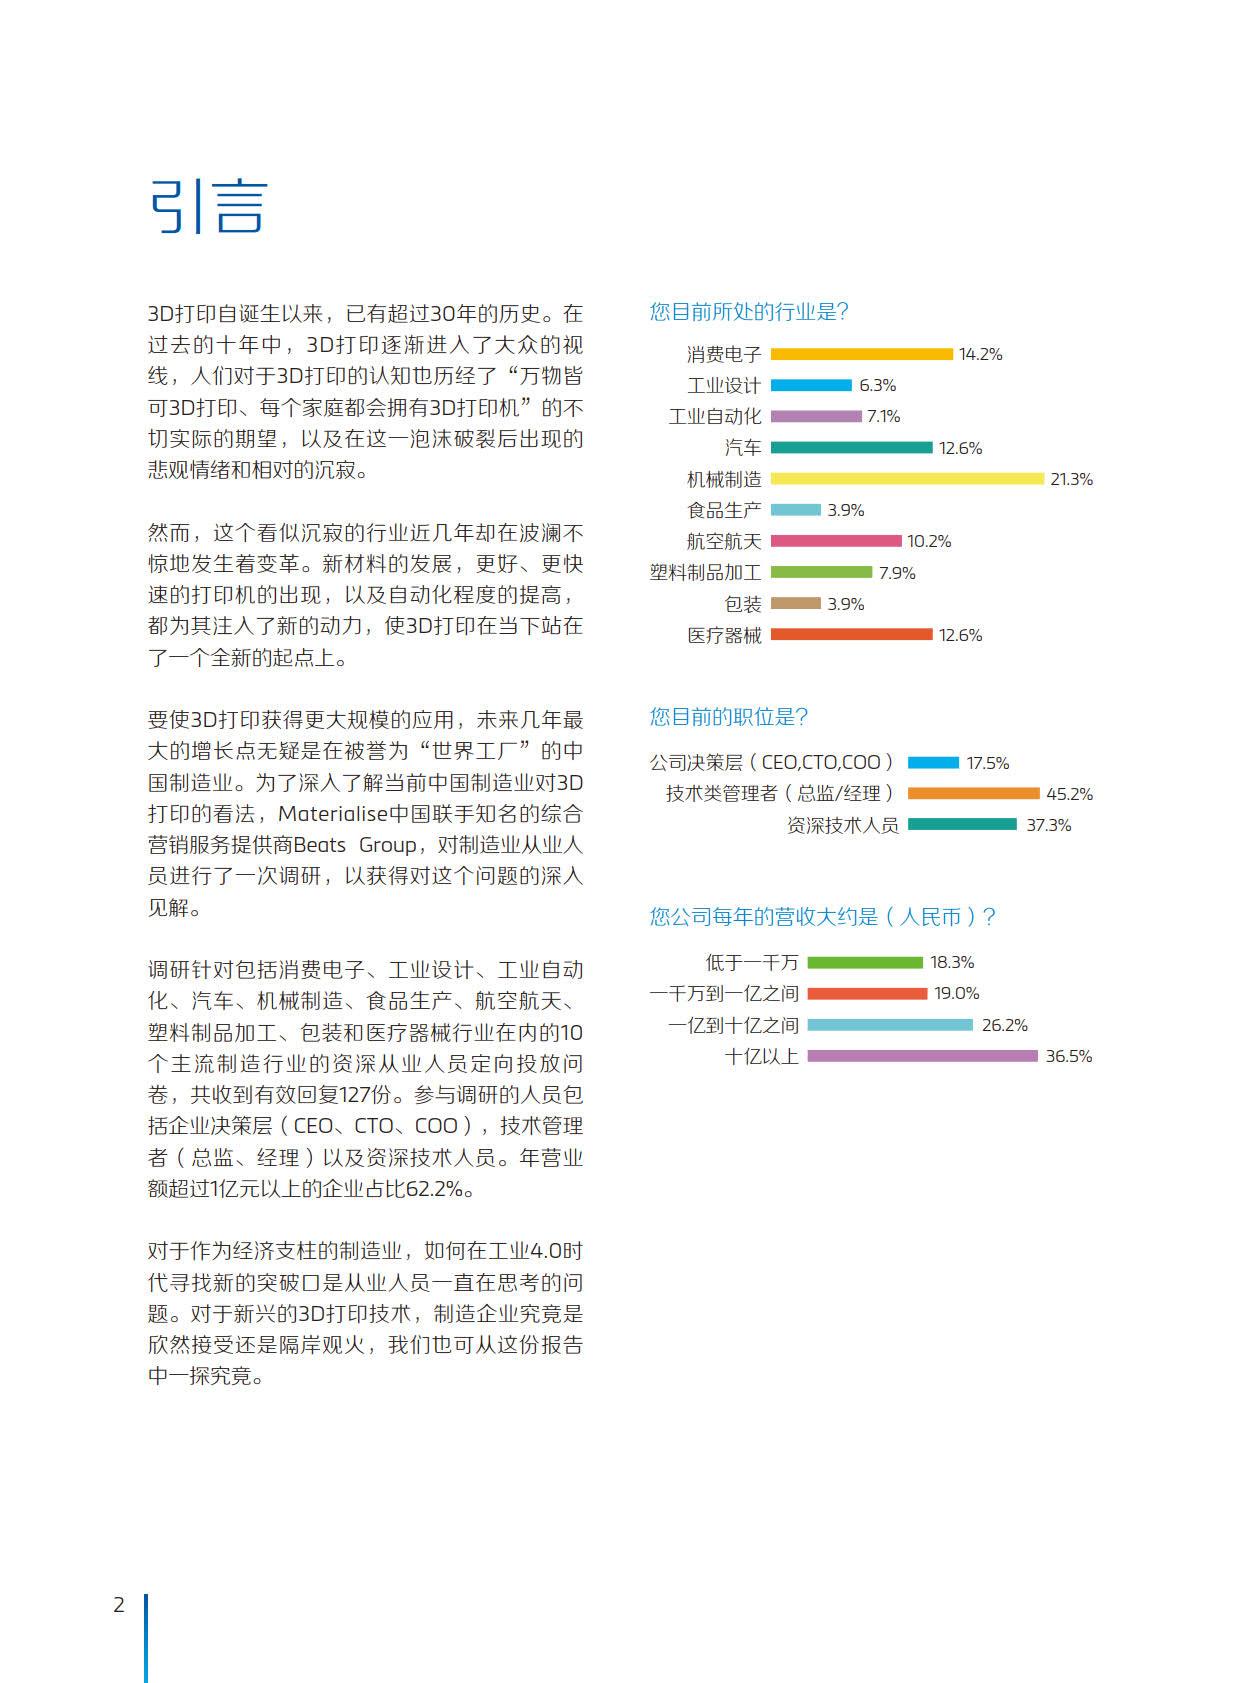 Materialise制造业调研报告_2.jpg